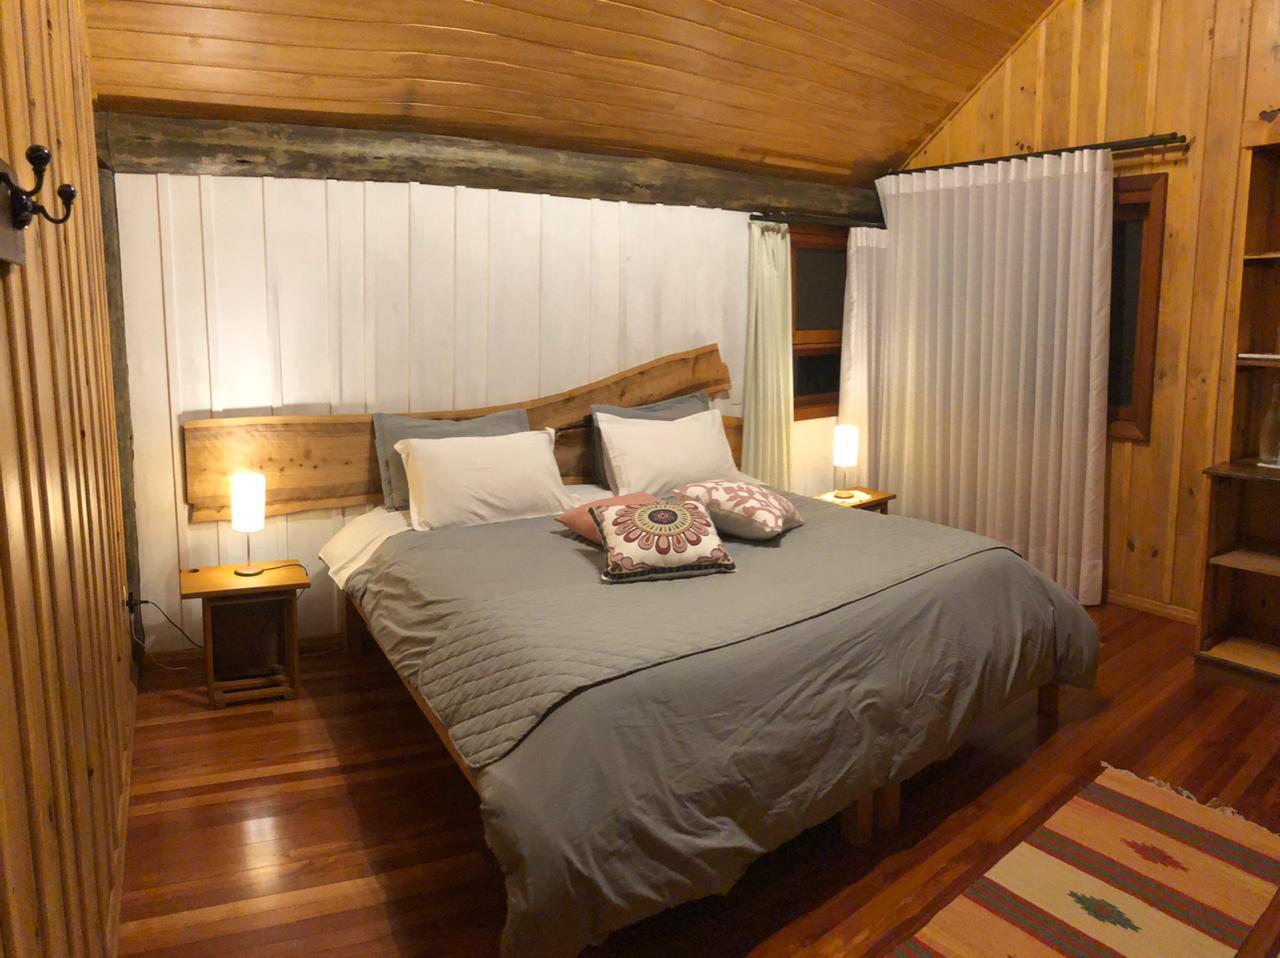 Mona  quarto cama - Monã